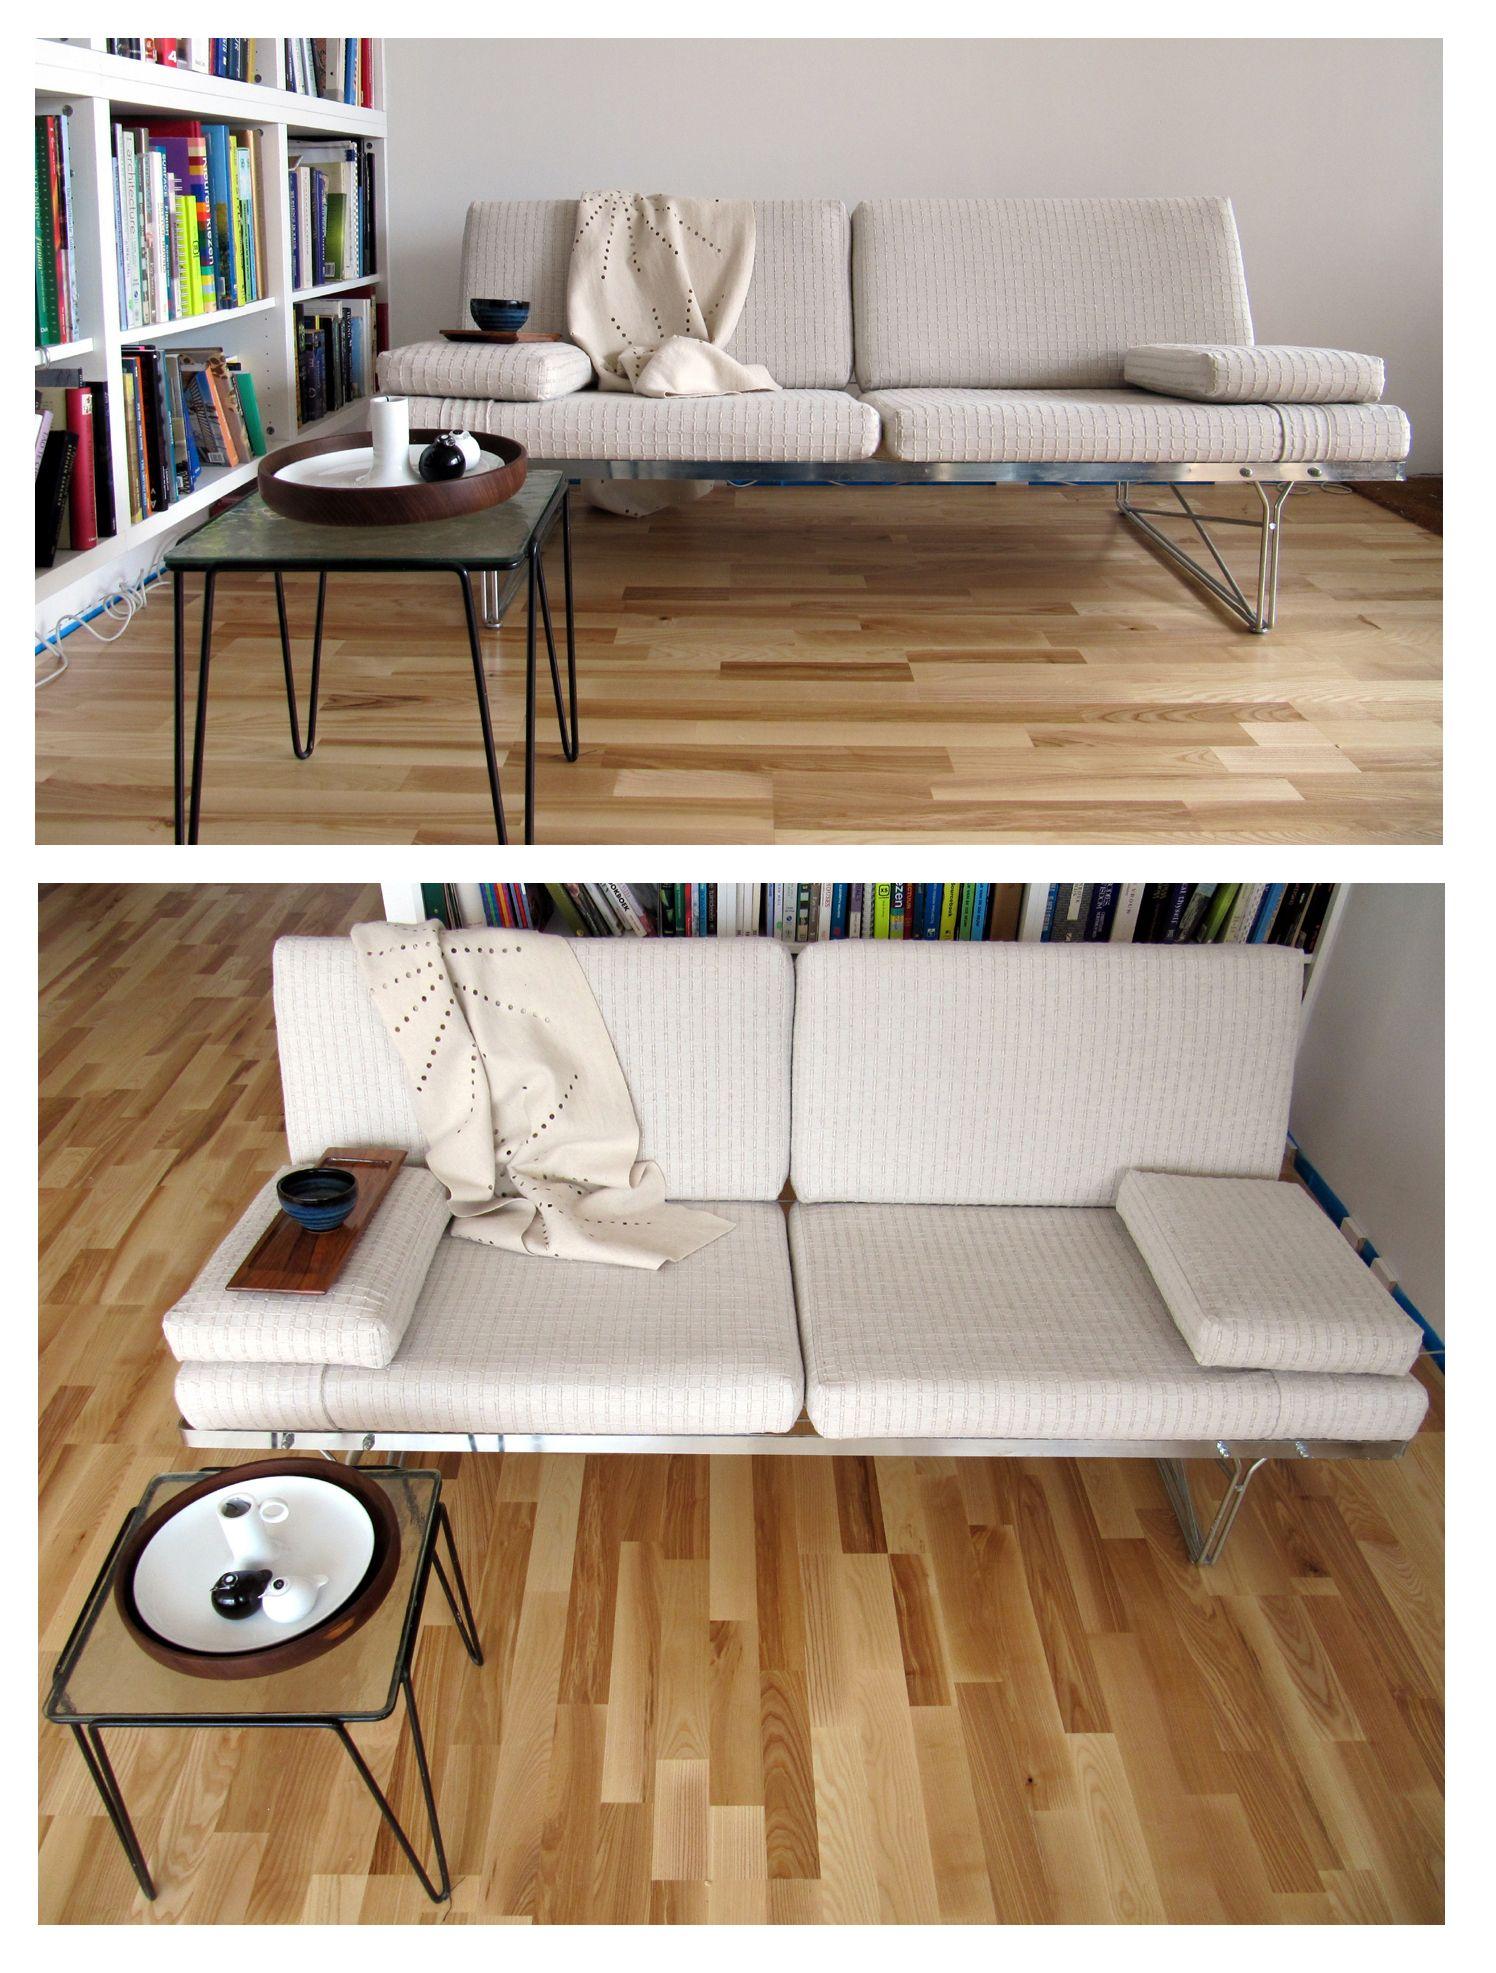 Vintage Ikea Re Upholstered My Vintage Ikea Moment Sofaniels Gammelgaard